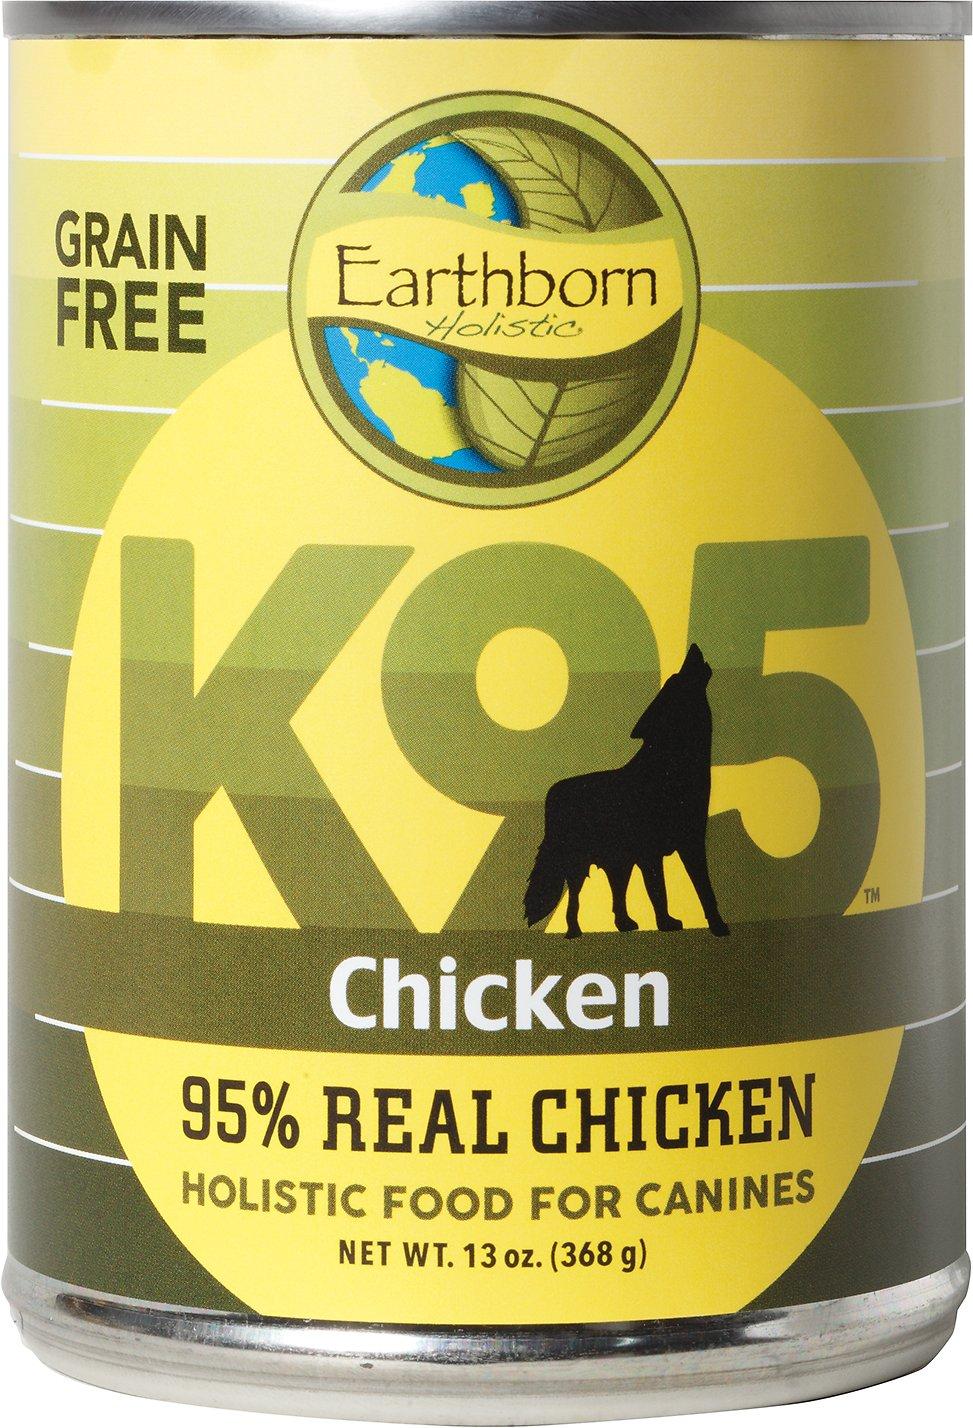 Earthborn Holistic K95 Chicken Recipe Grain-Free Canned Dog Food, 13-oz